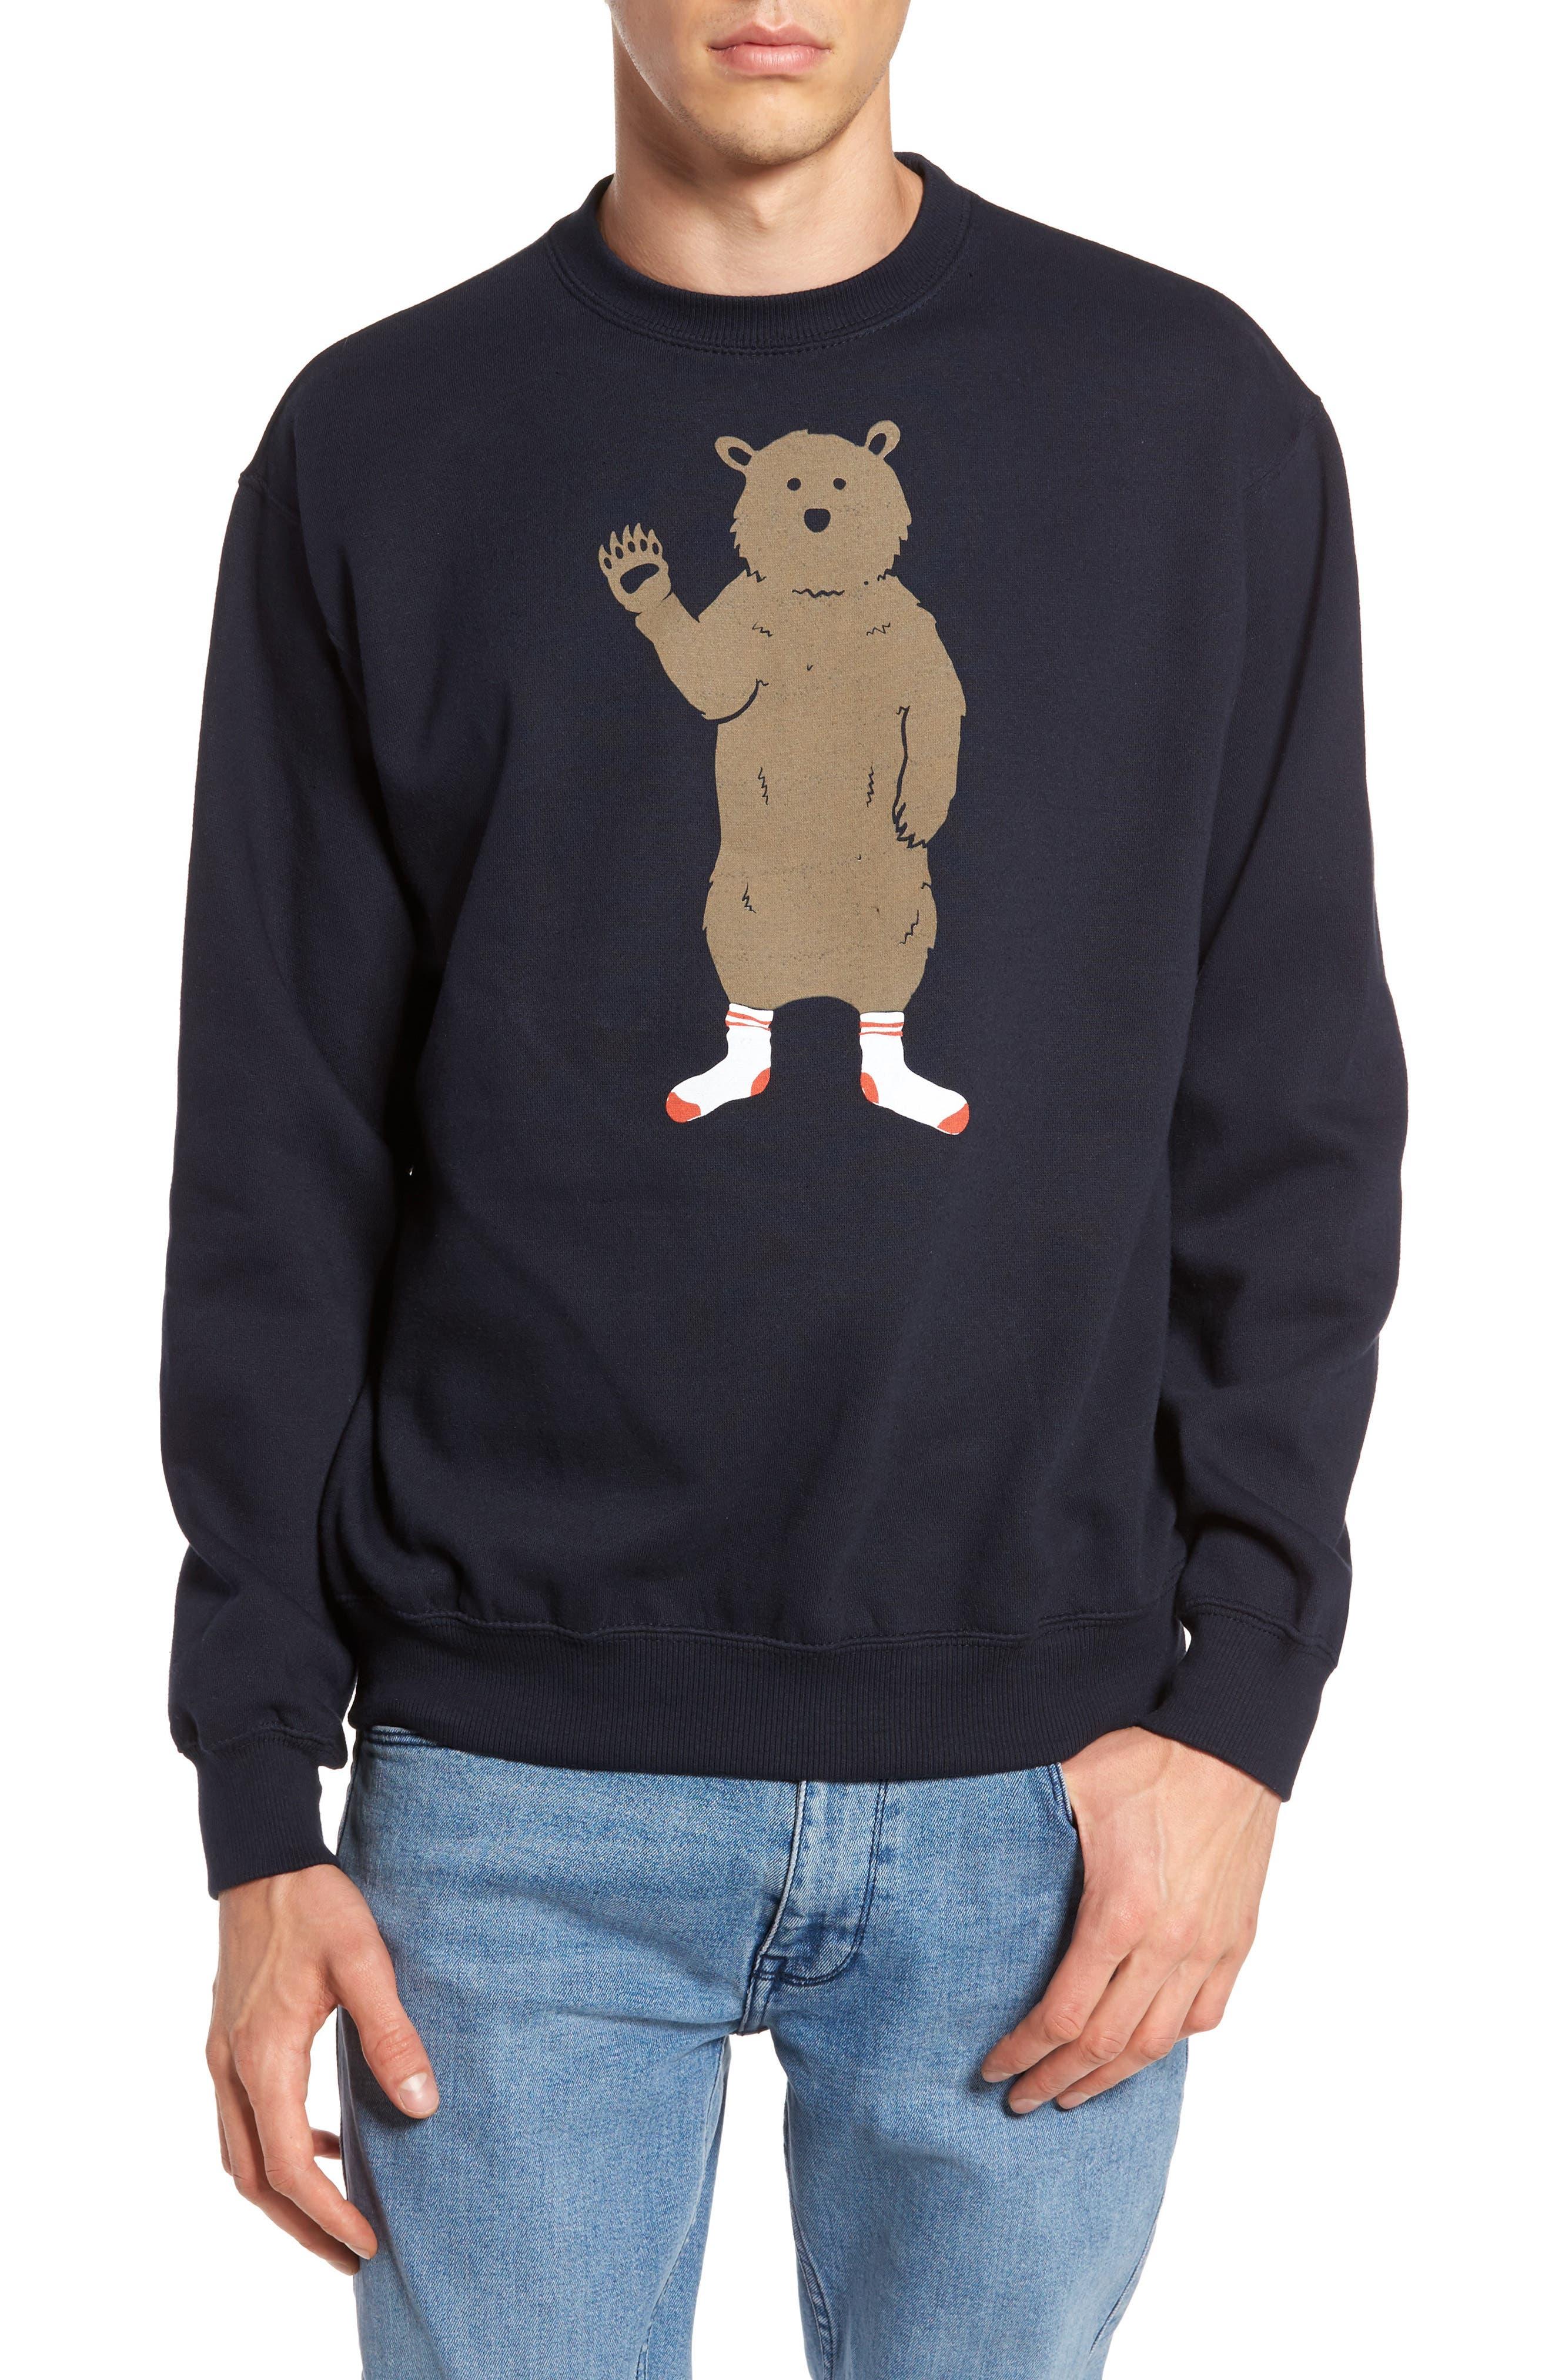 Bear in Socks Sweatshirt,                         Main,                         color, Navy